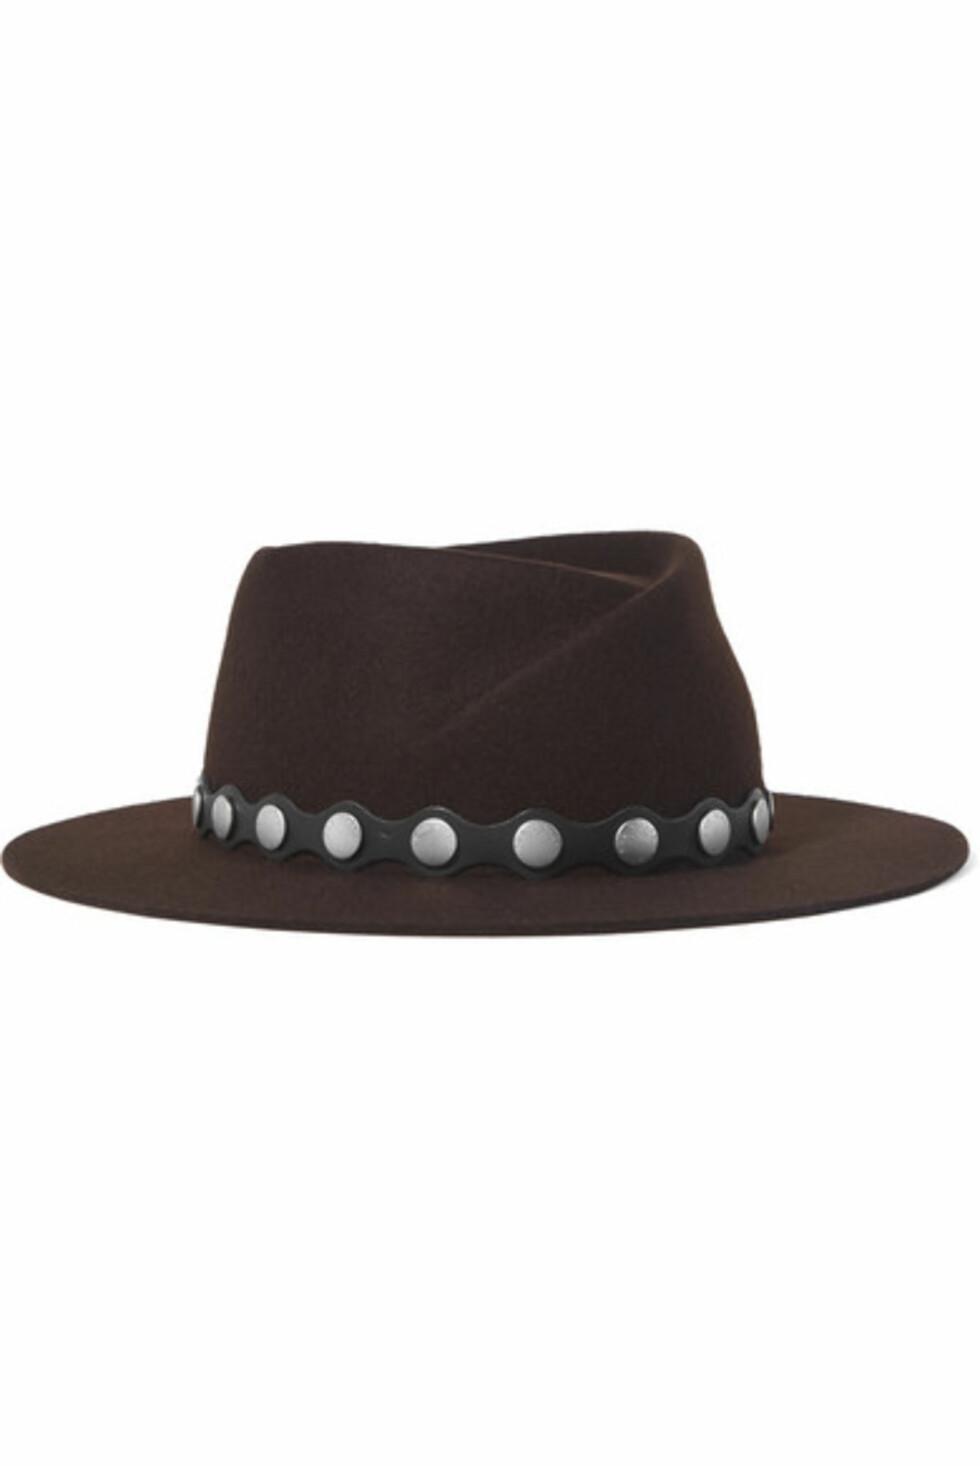 Hatt fra Rag & Bone |2500,-| https://www.net-a-porter.com/no/en/product/984505/rag_and_bone/edie-studded-leather-trimmed-wool-fedora